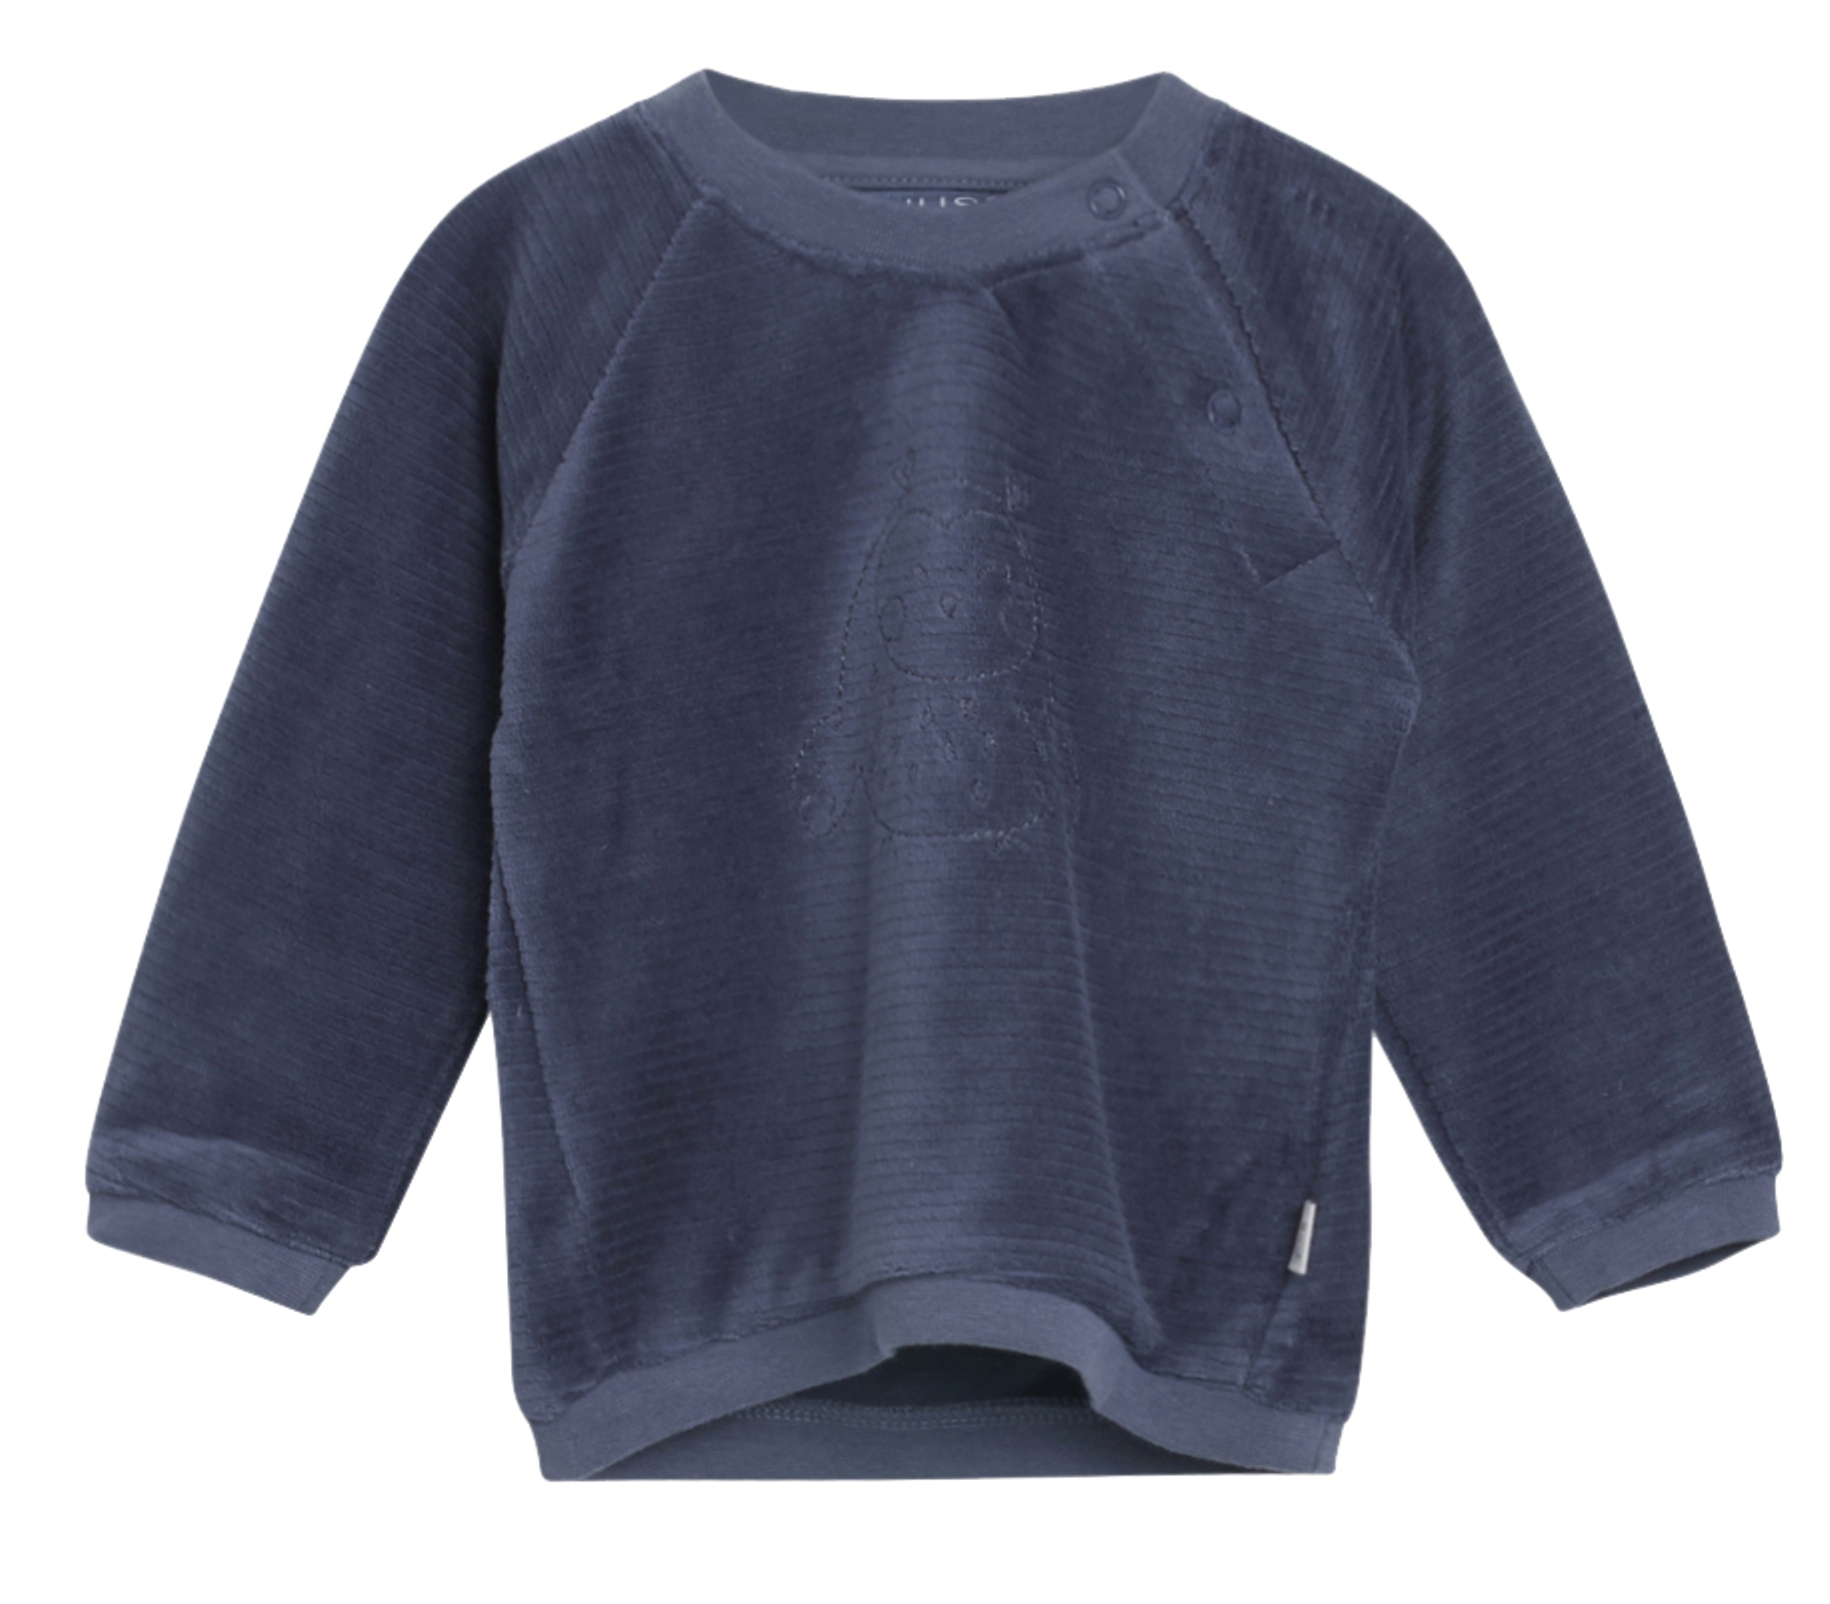 Hust & Claire Baby Sweatshirt Silva Blue Storm